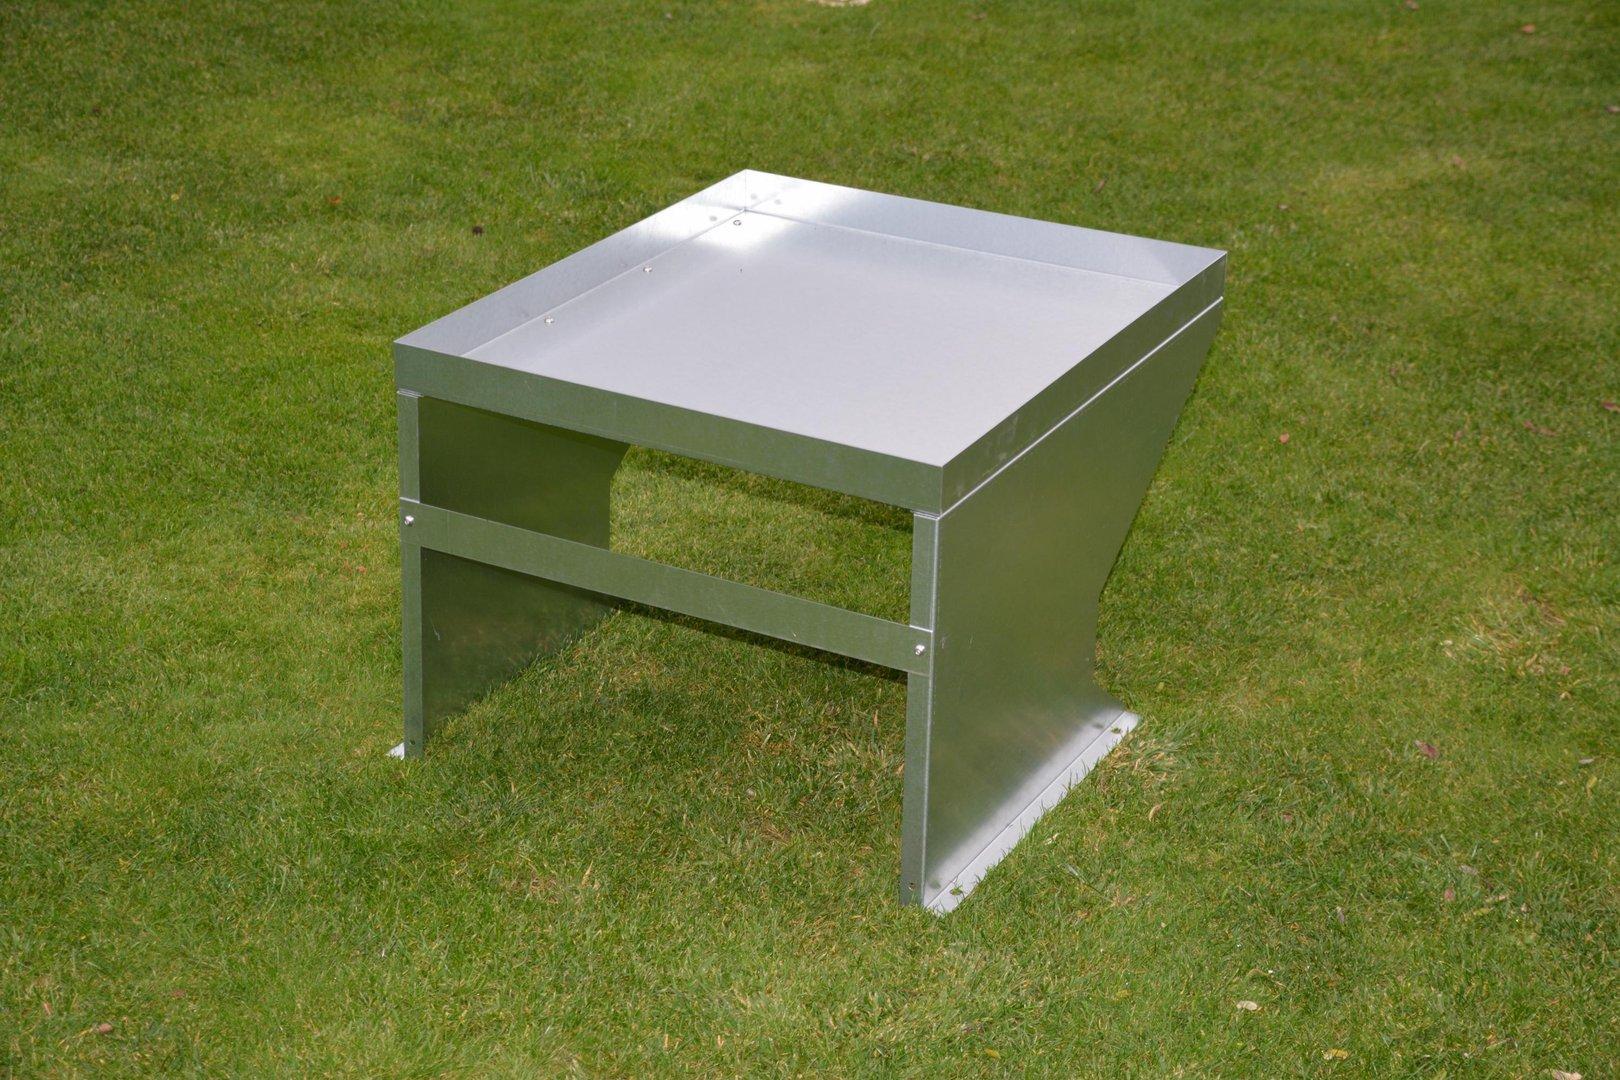 m hroboter garage pflanzdach verzinkt aus metall. Black Bedroom Furniture Sets. Home Design Ideas